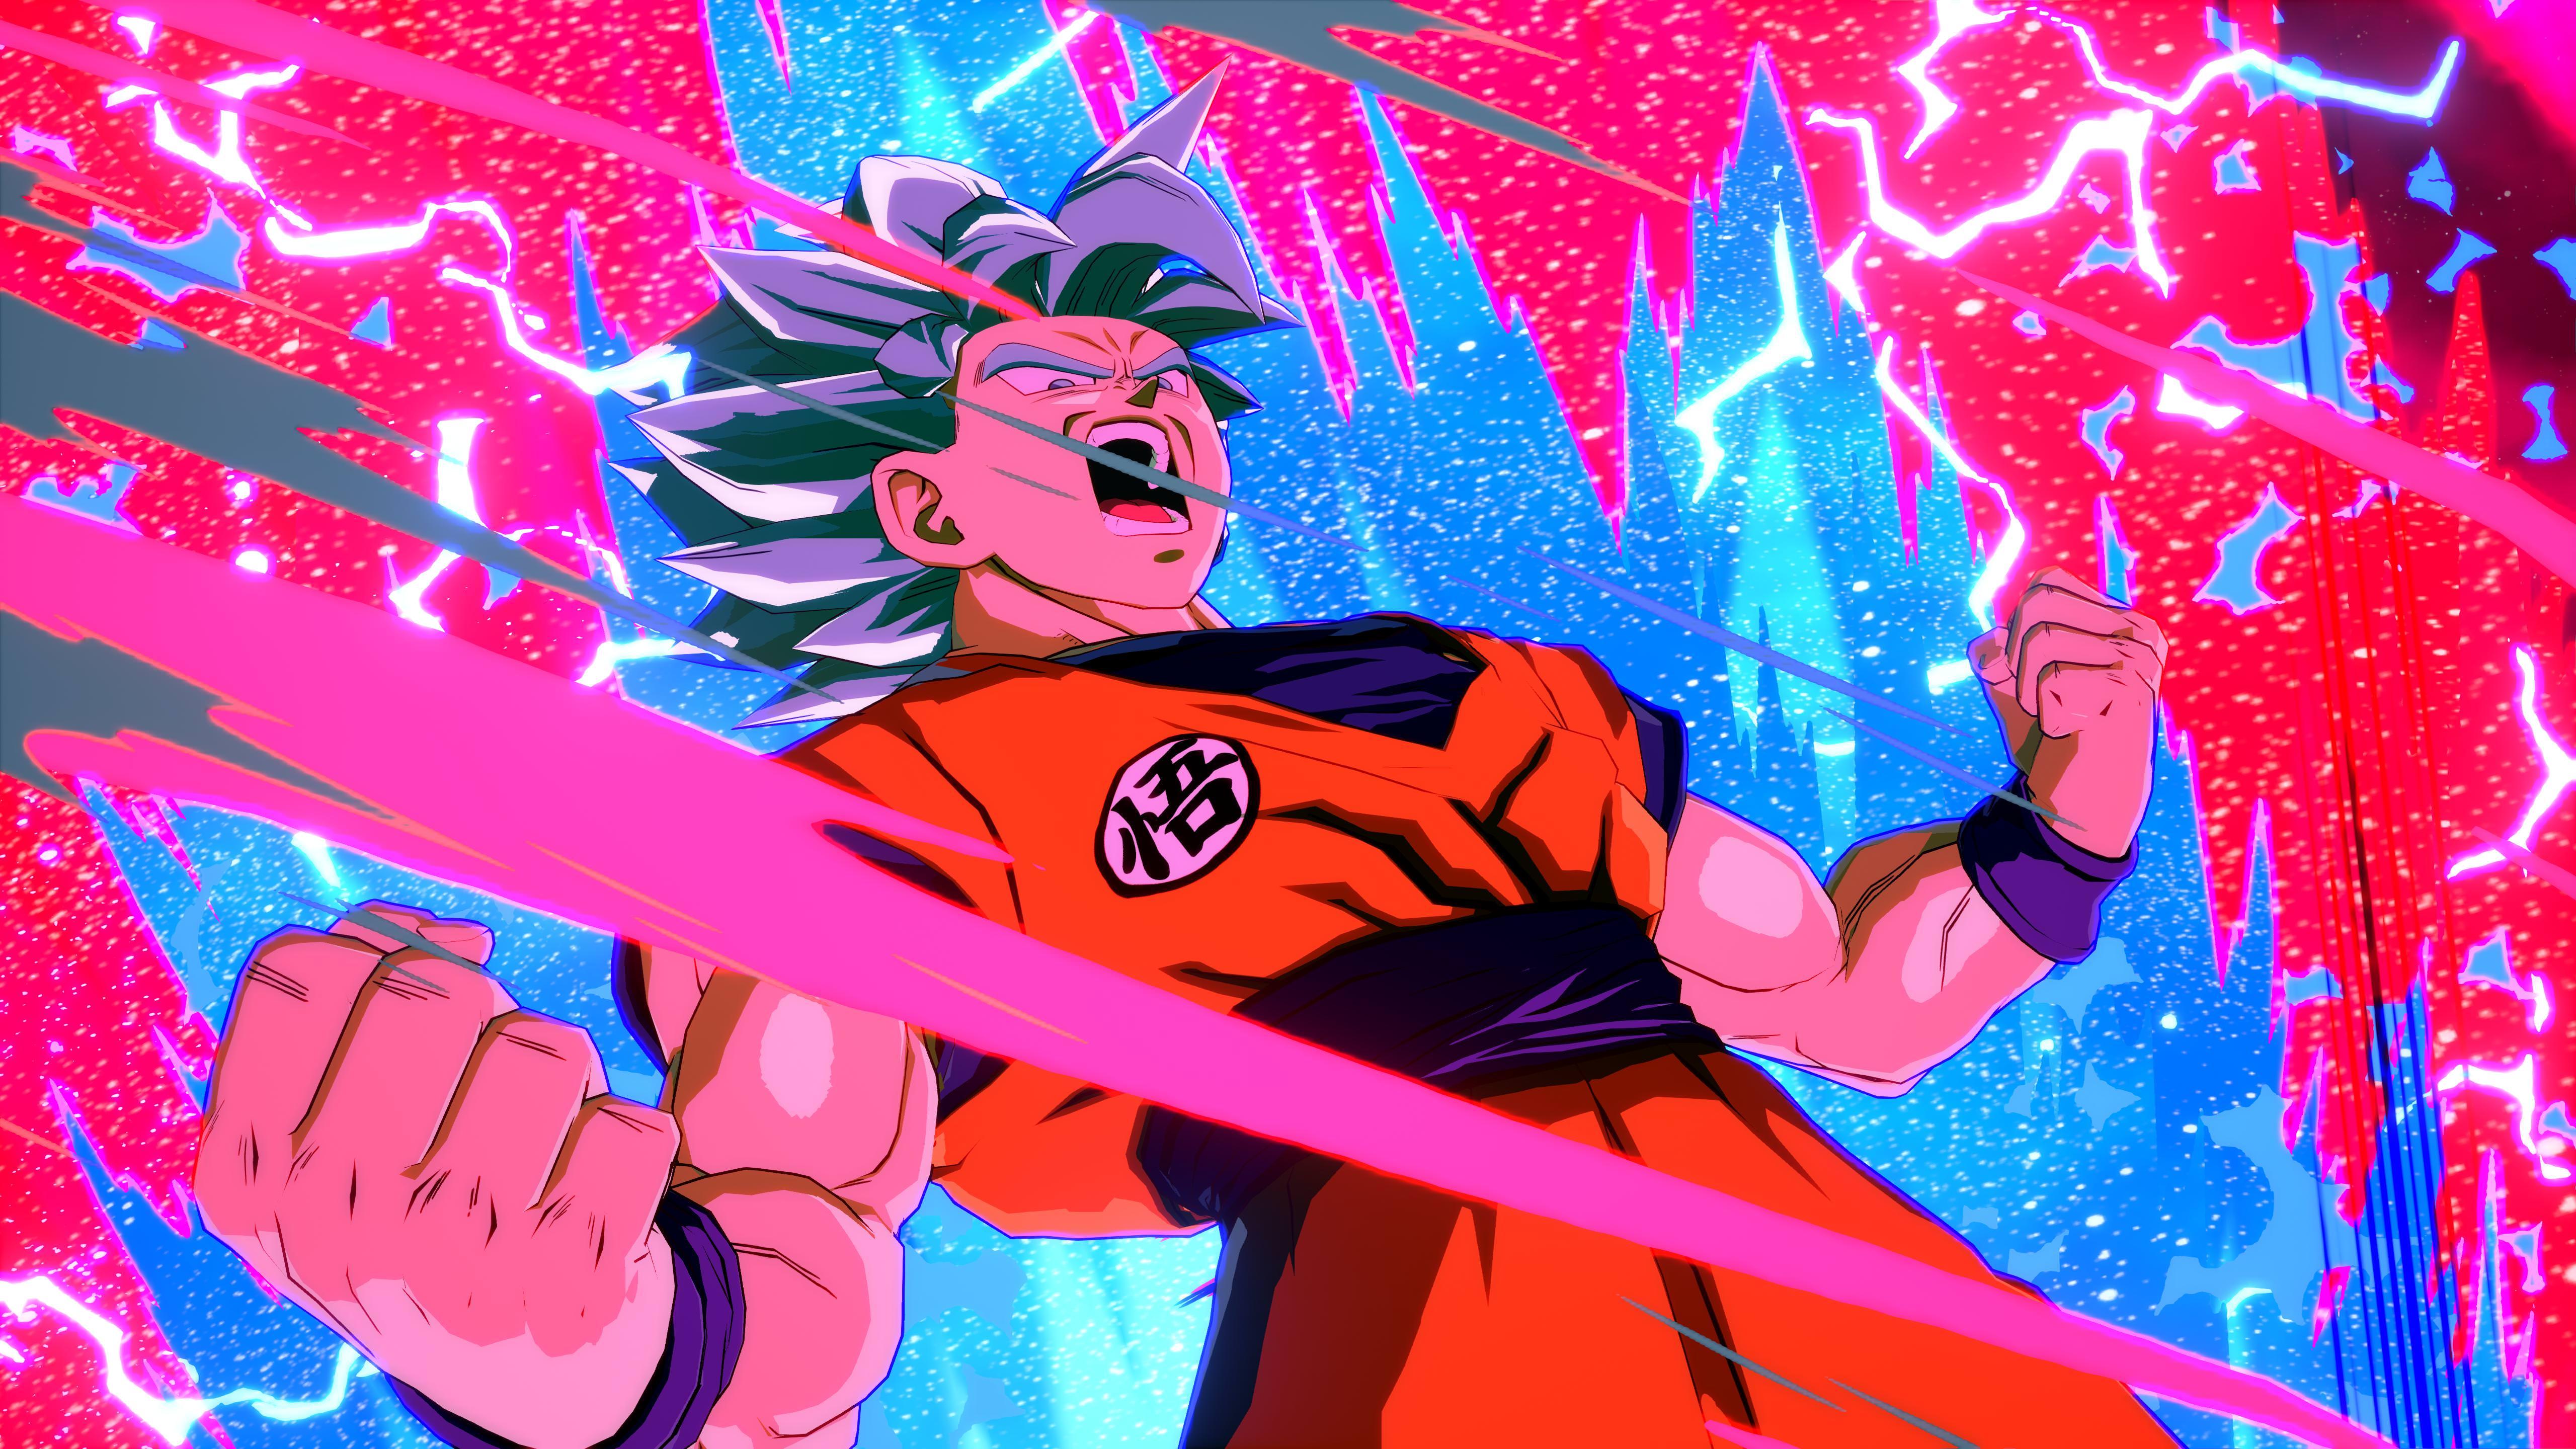 Goku Dragon Ball FighterZ 5K, HD Anime, 4k Wallpapers ...